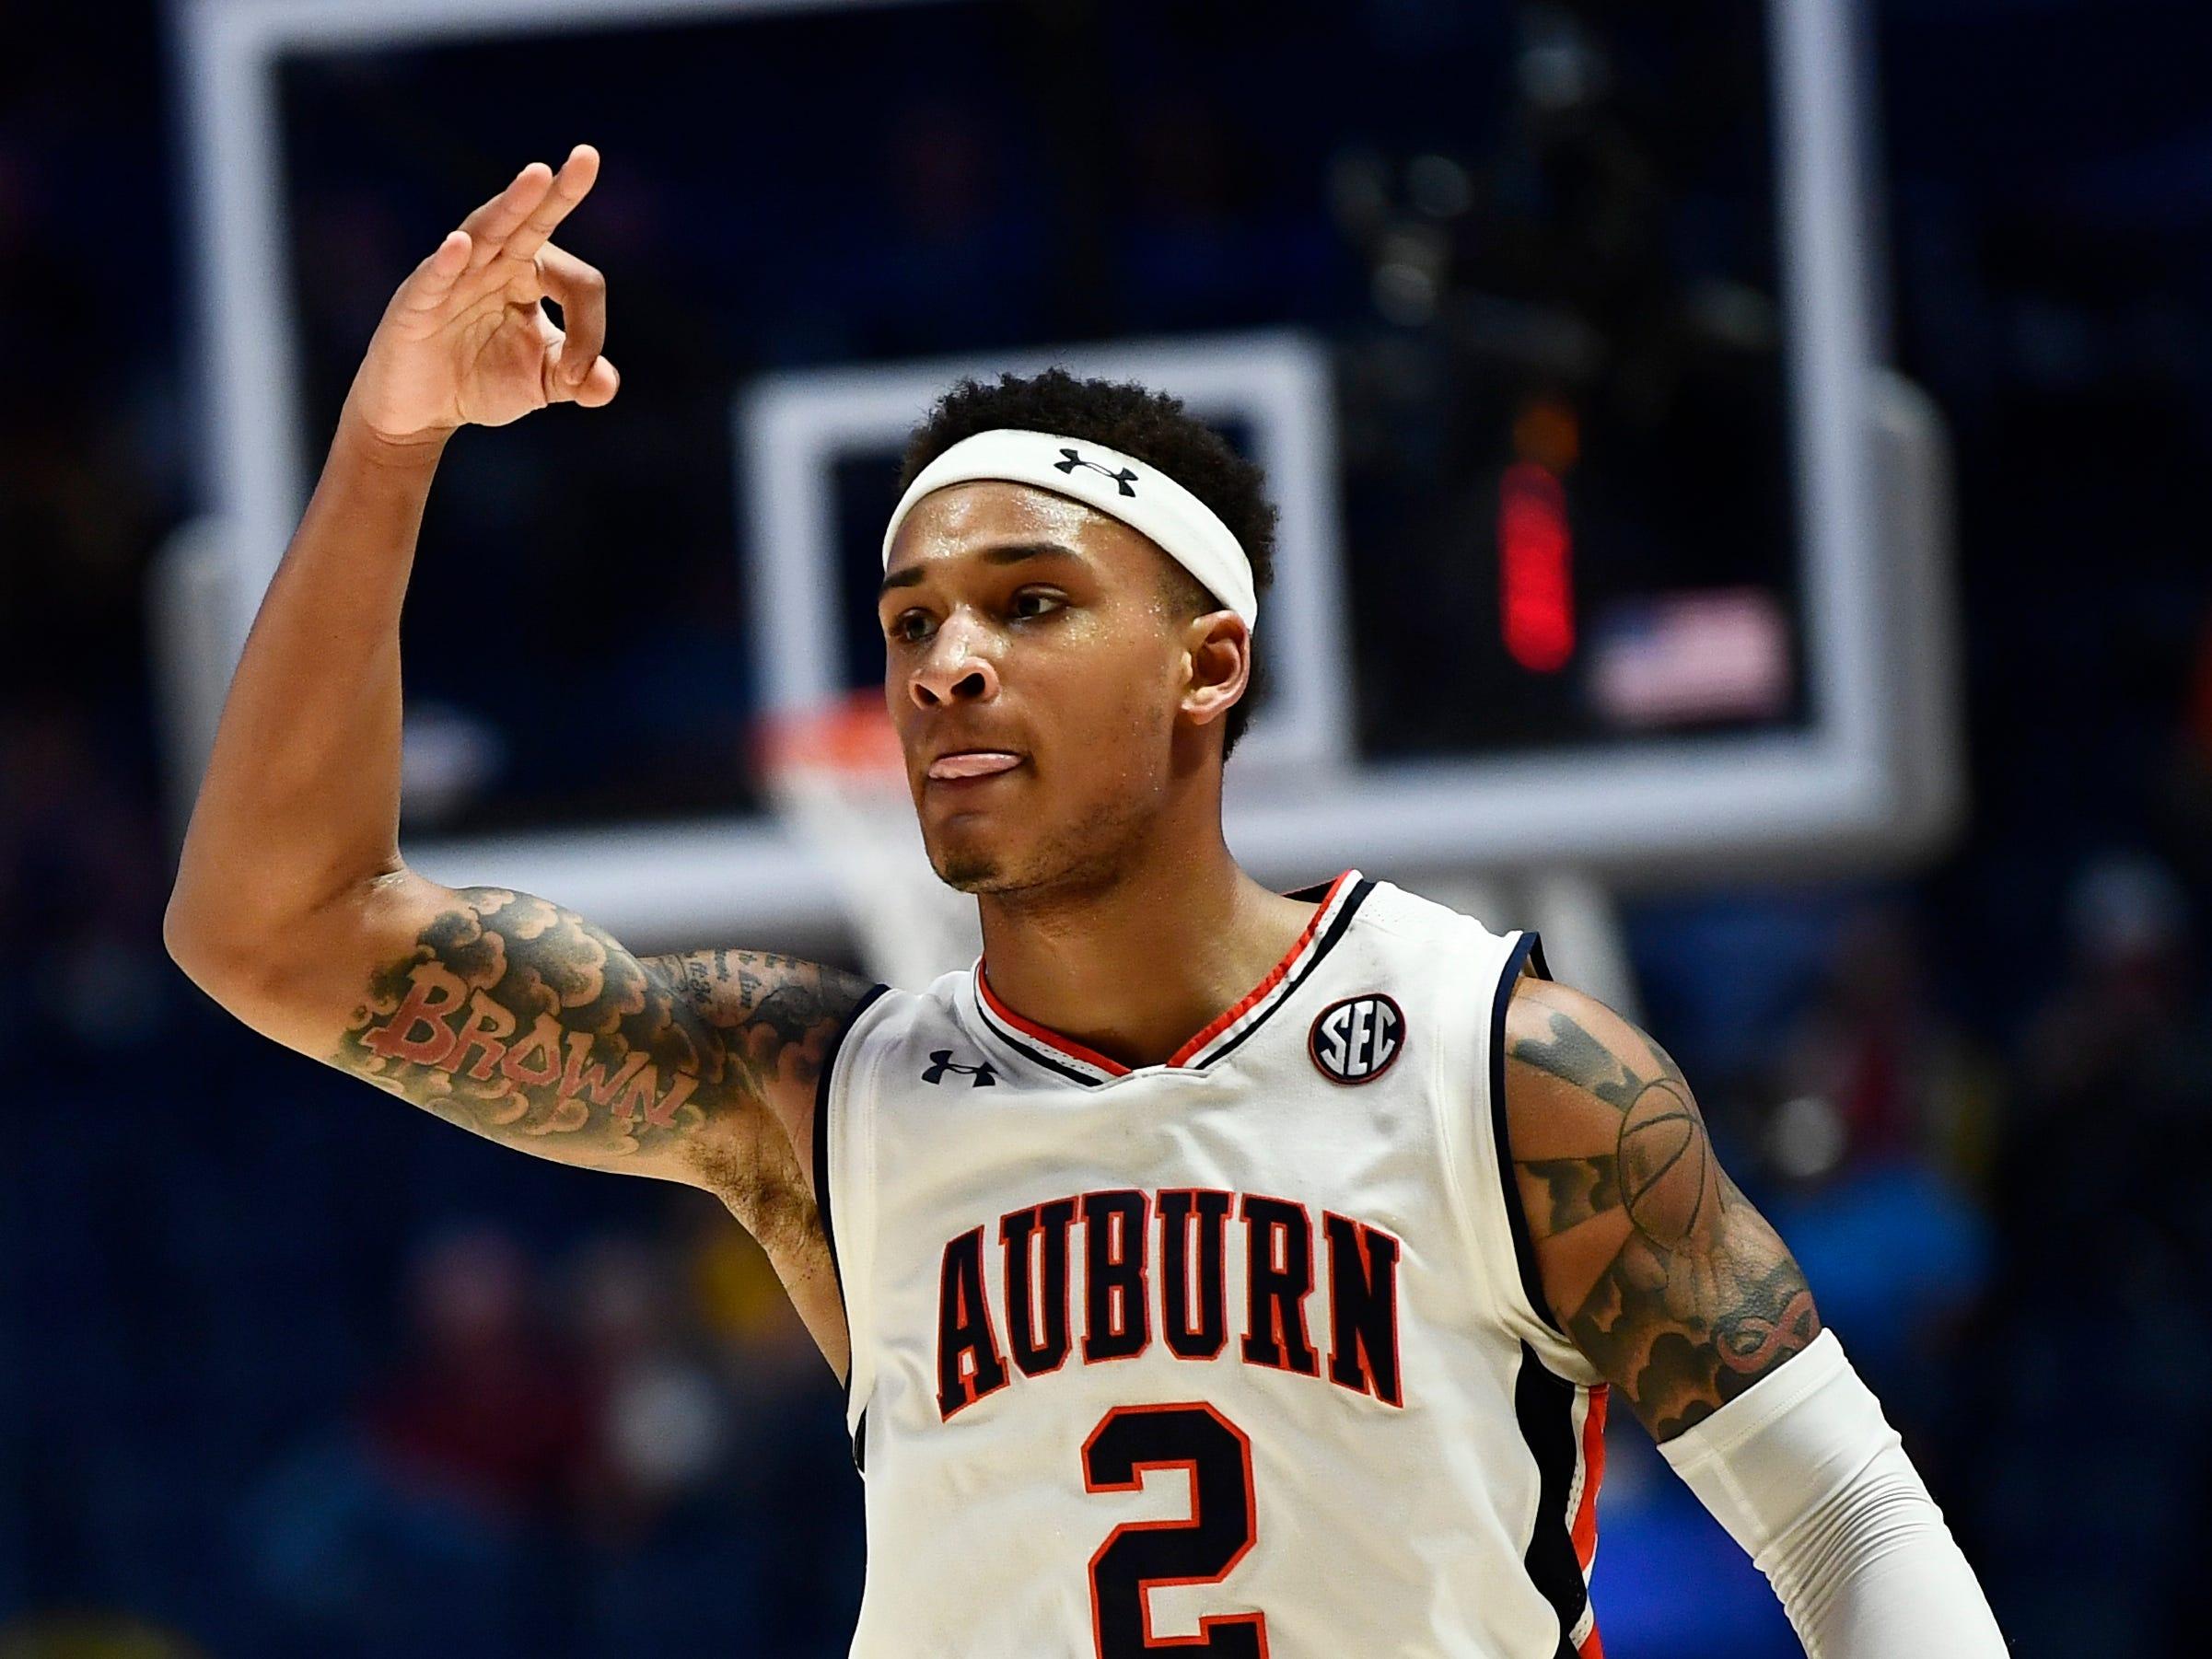 Auburn guard Bryce Brown (2) celebrates a three-pointer during the second half of the SEC Men's Basketball Tournament game at Bridgestone Arena in Nashville, Tenn., Thursday, March 14, 2019.